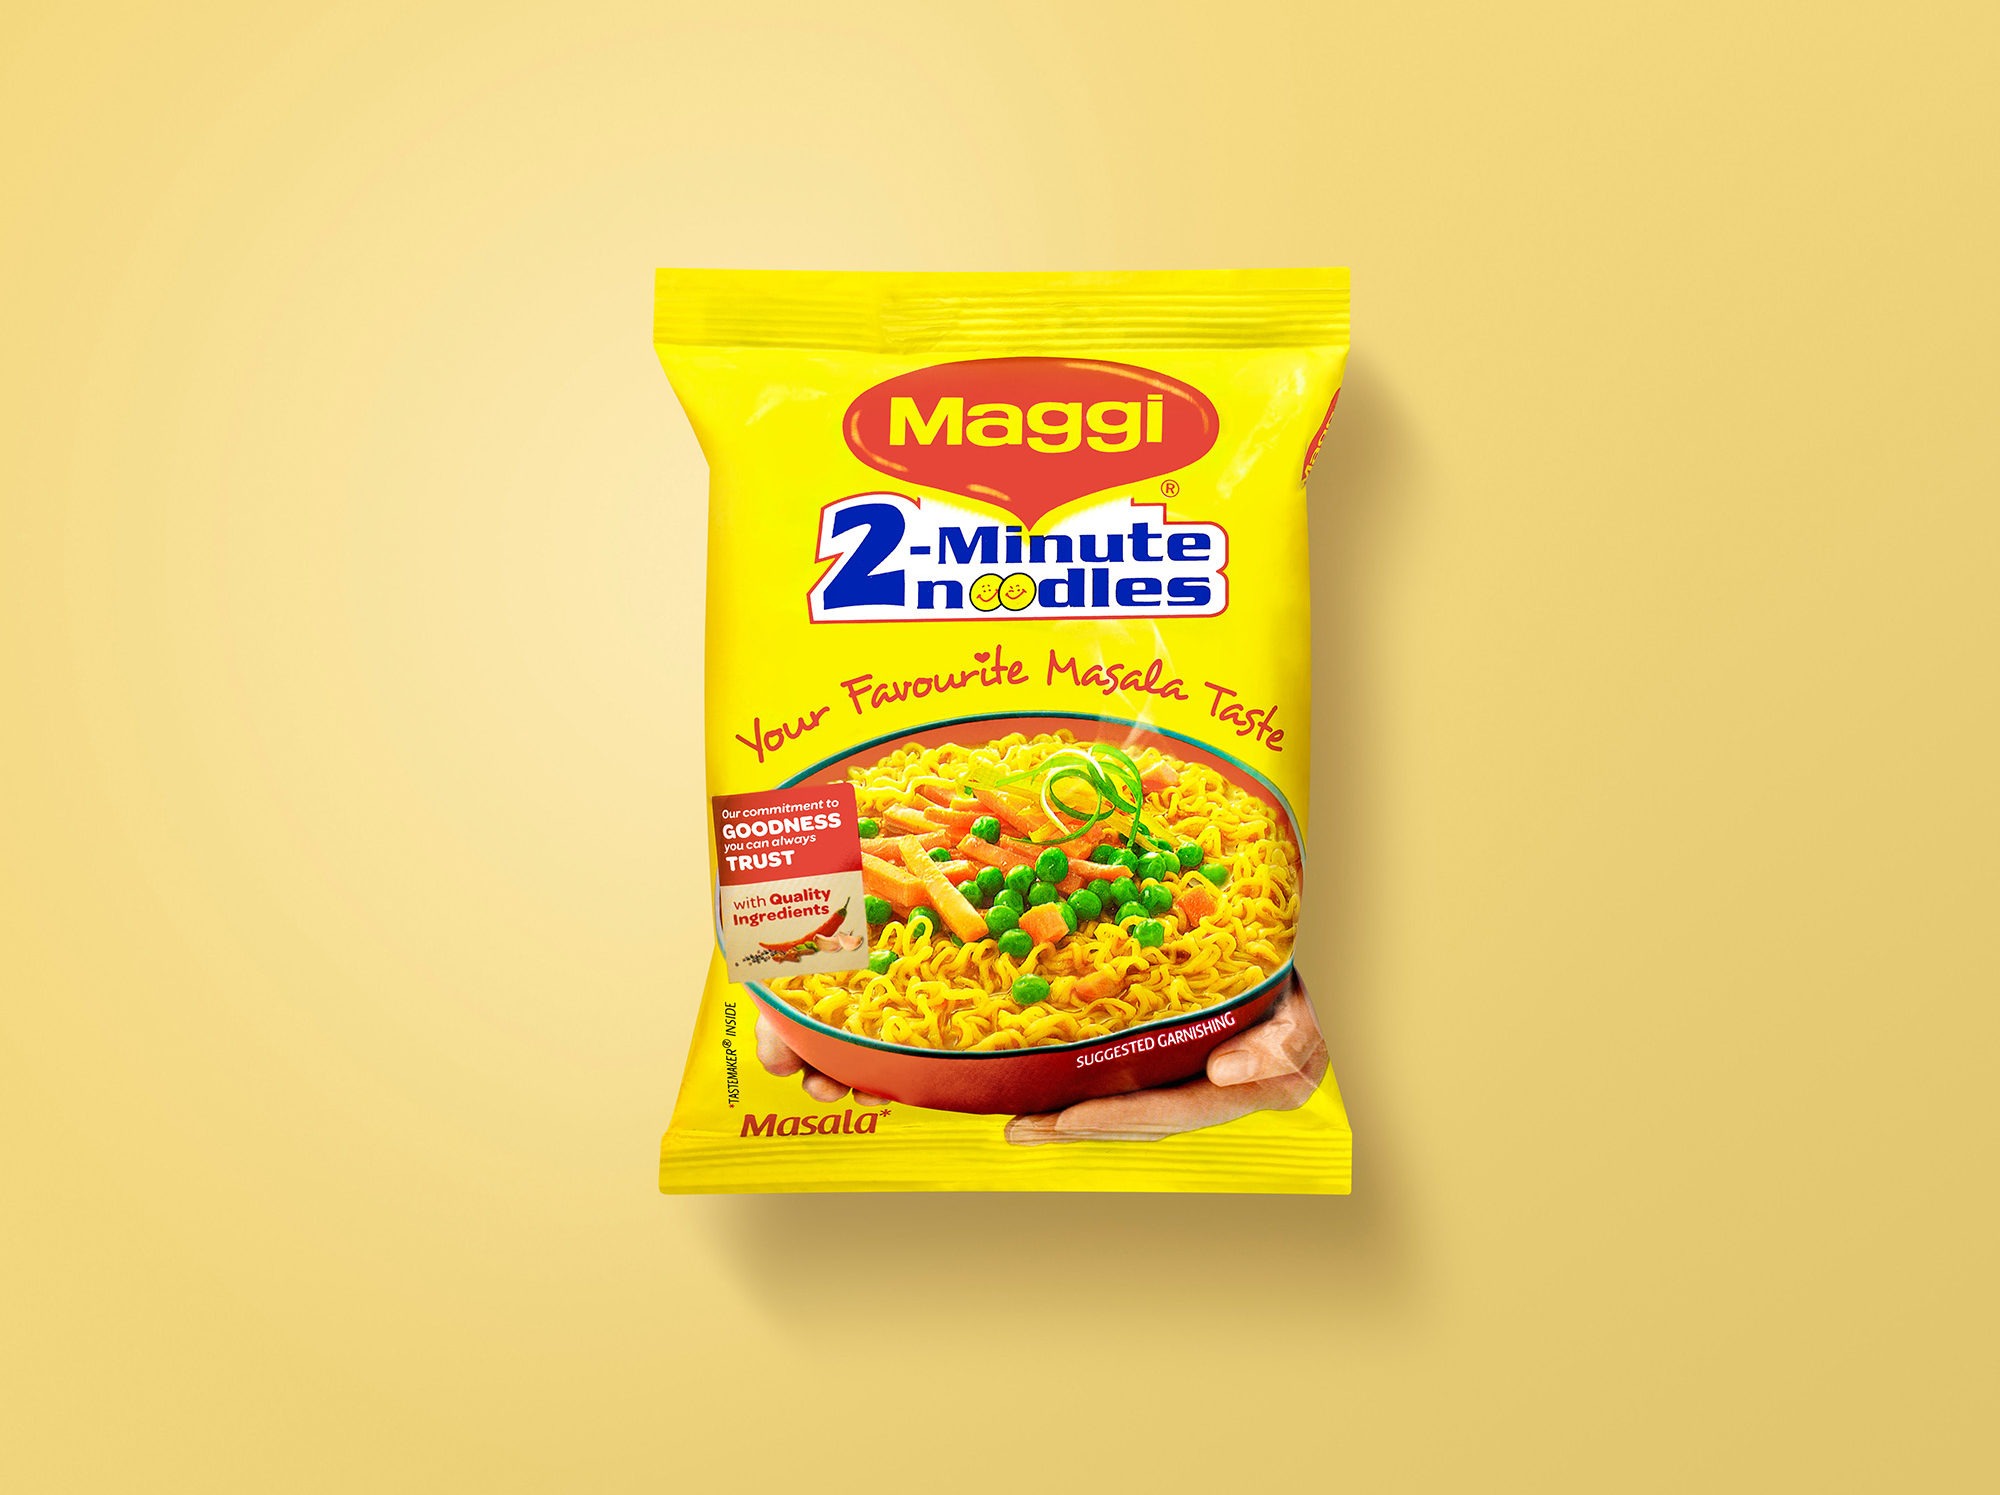 Image of a bag of noodles